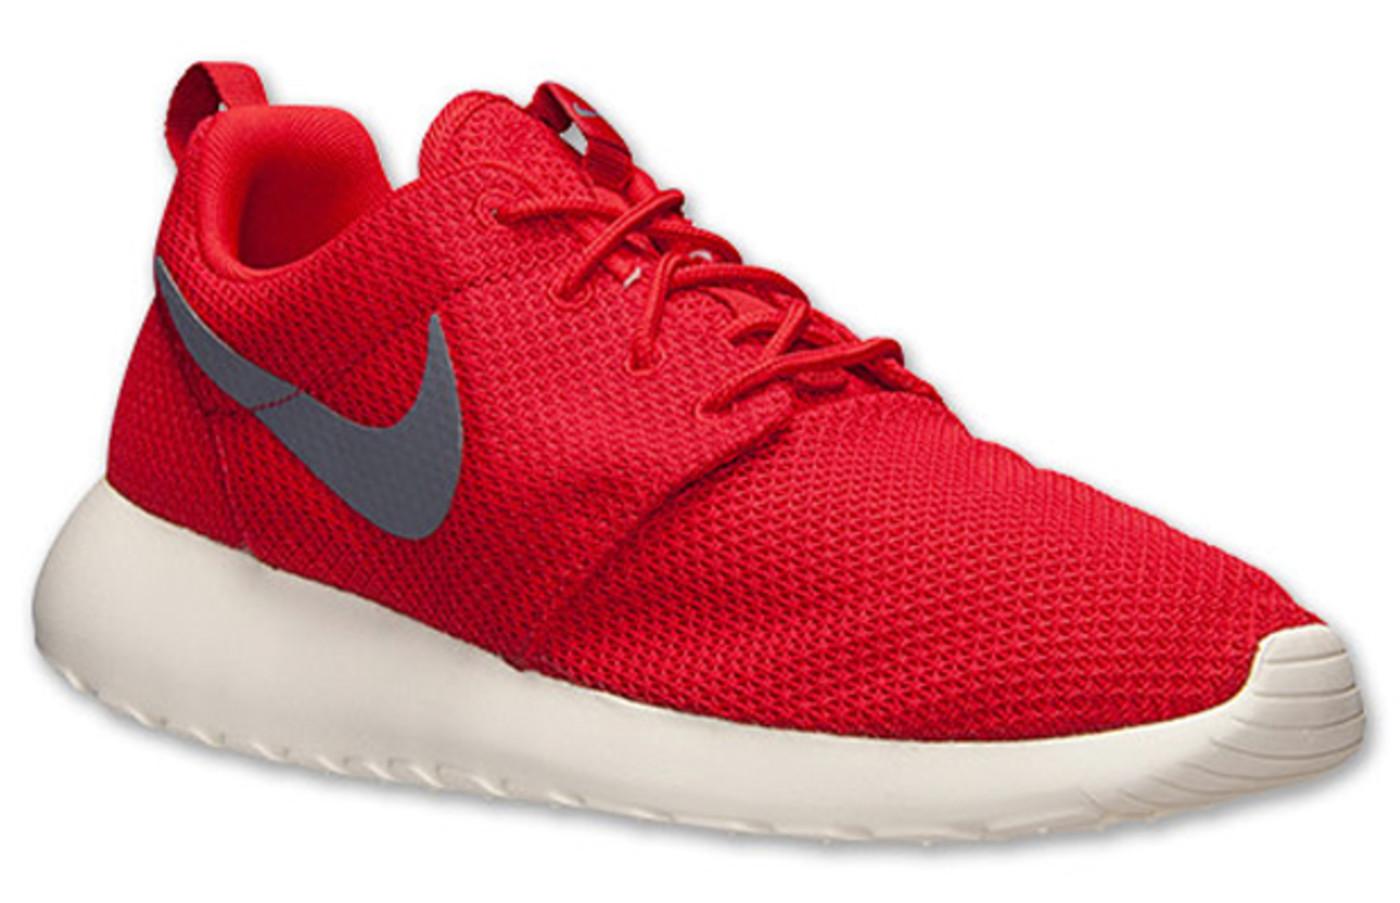 Day: Nike Roshe Run \